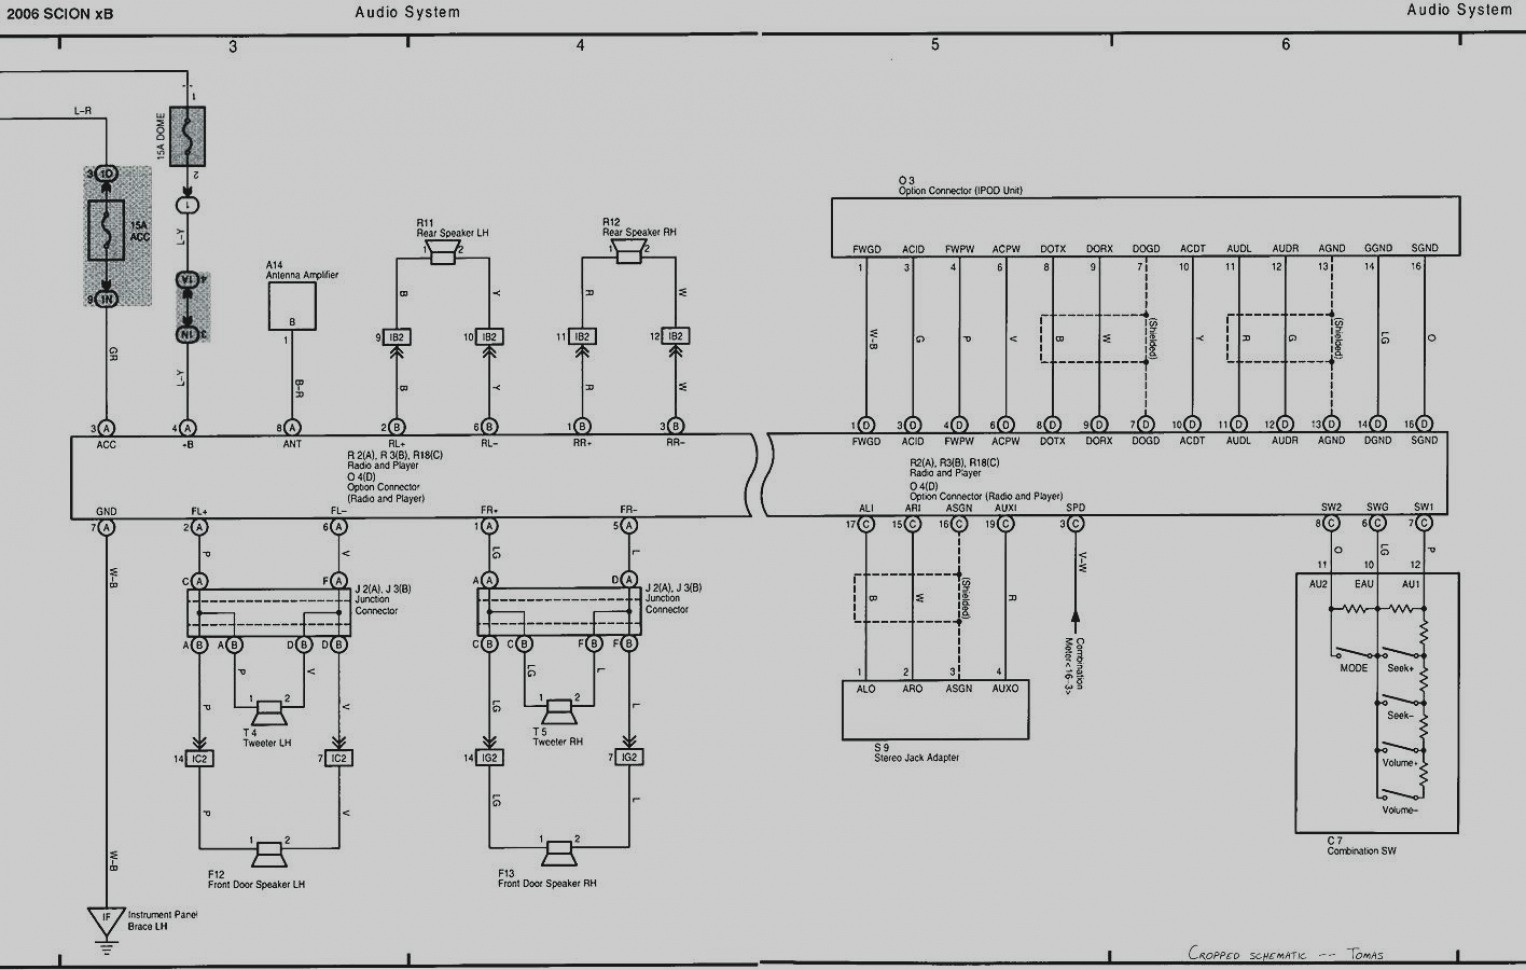 2004 scion xb radio wiring